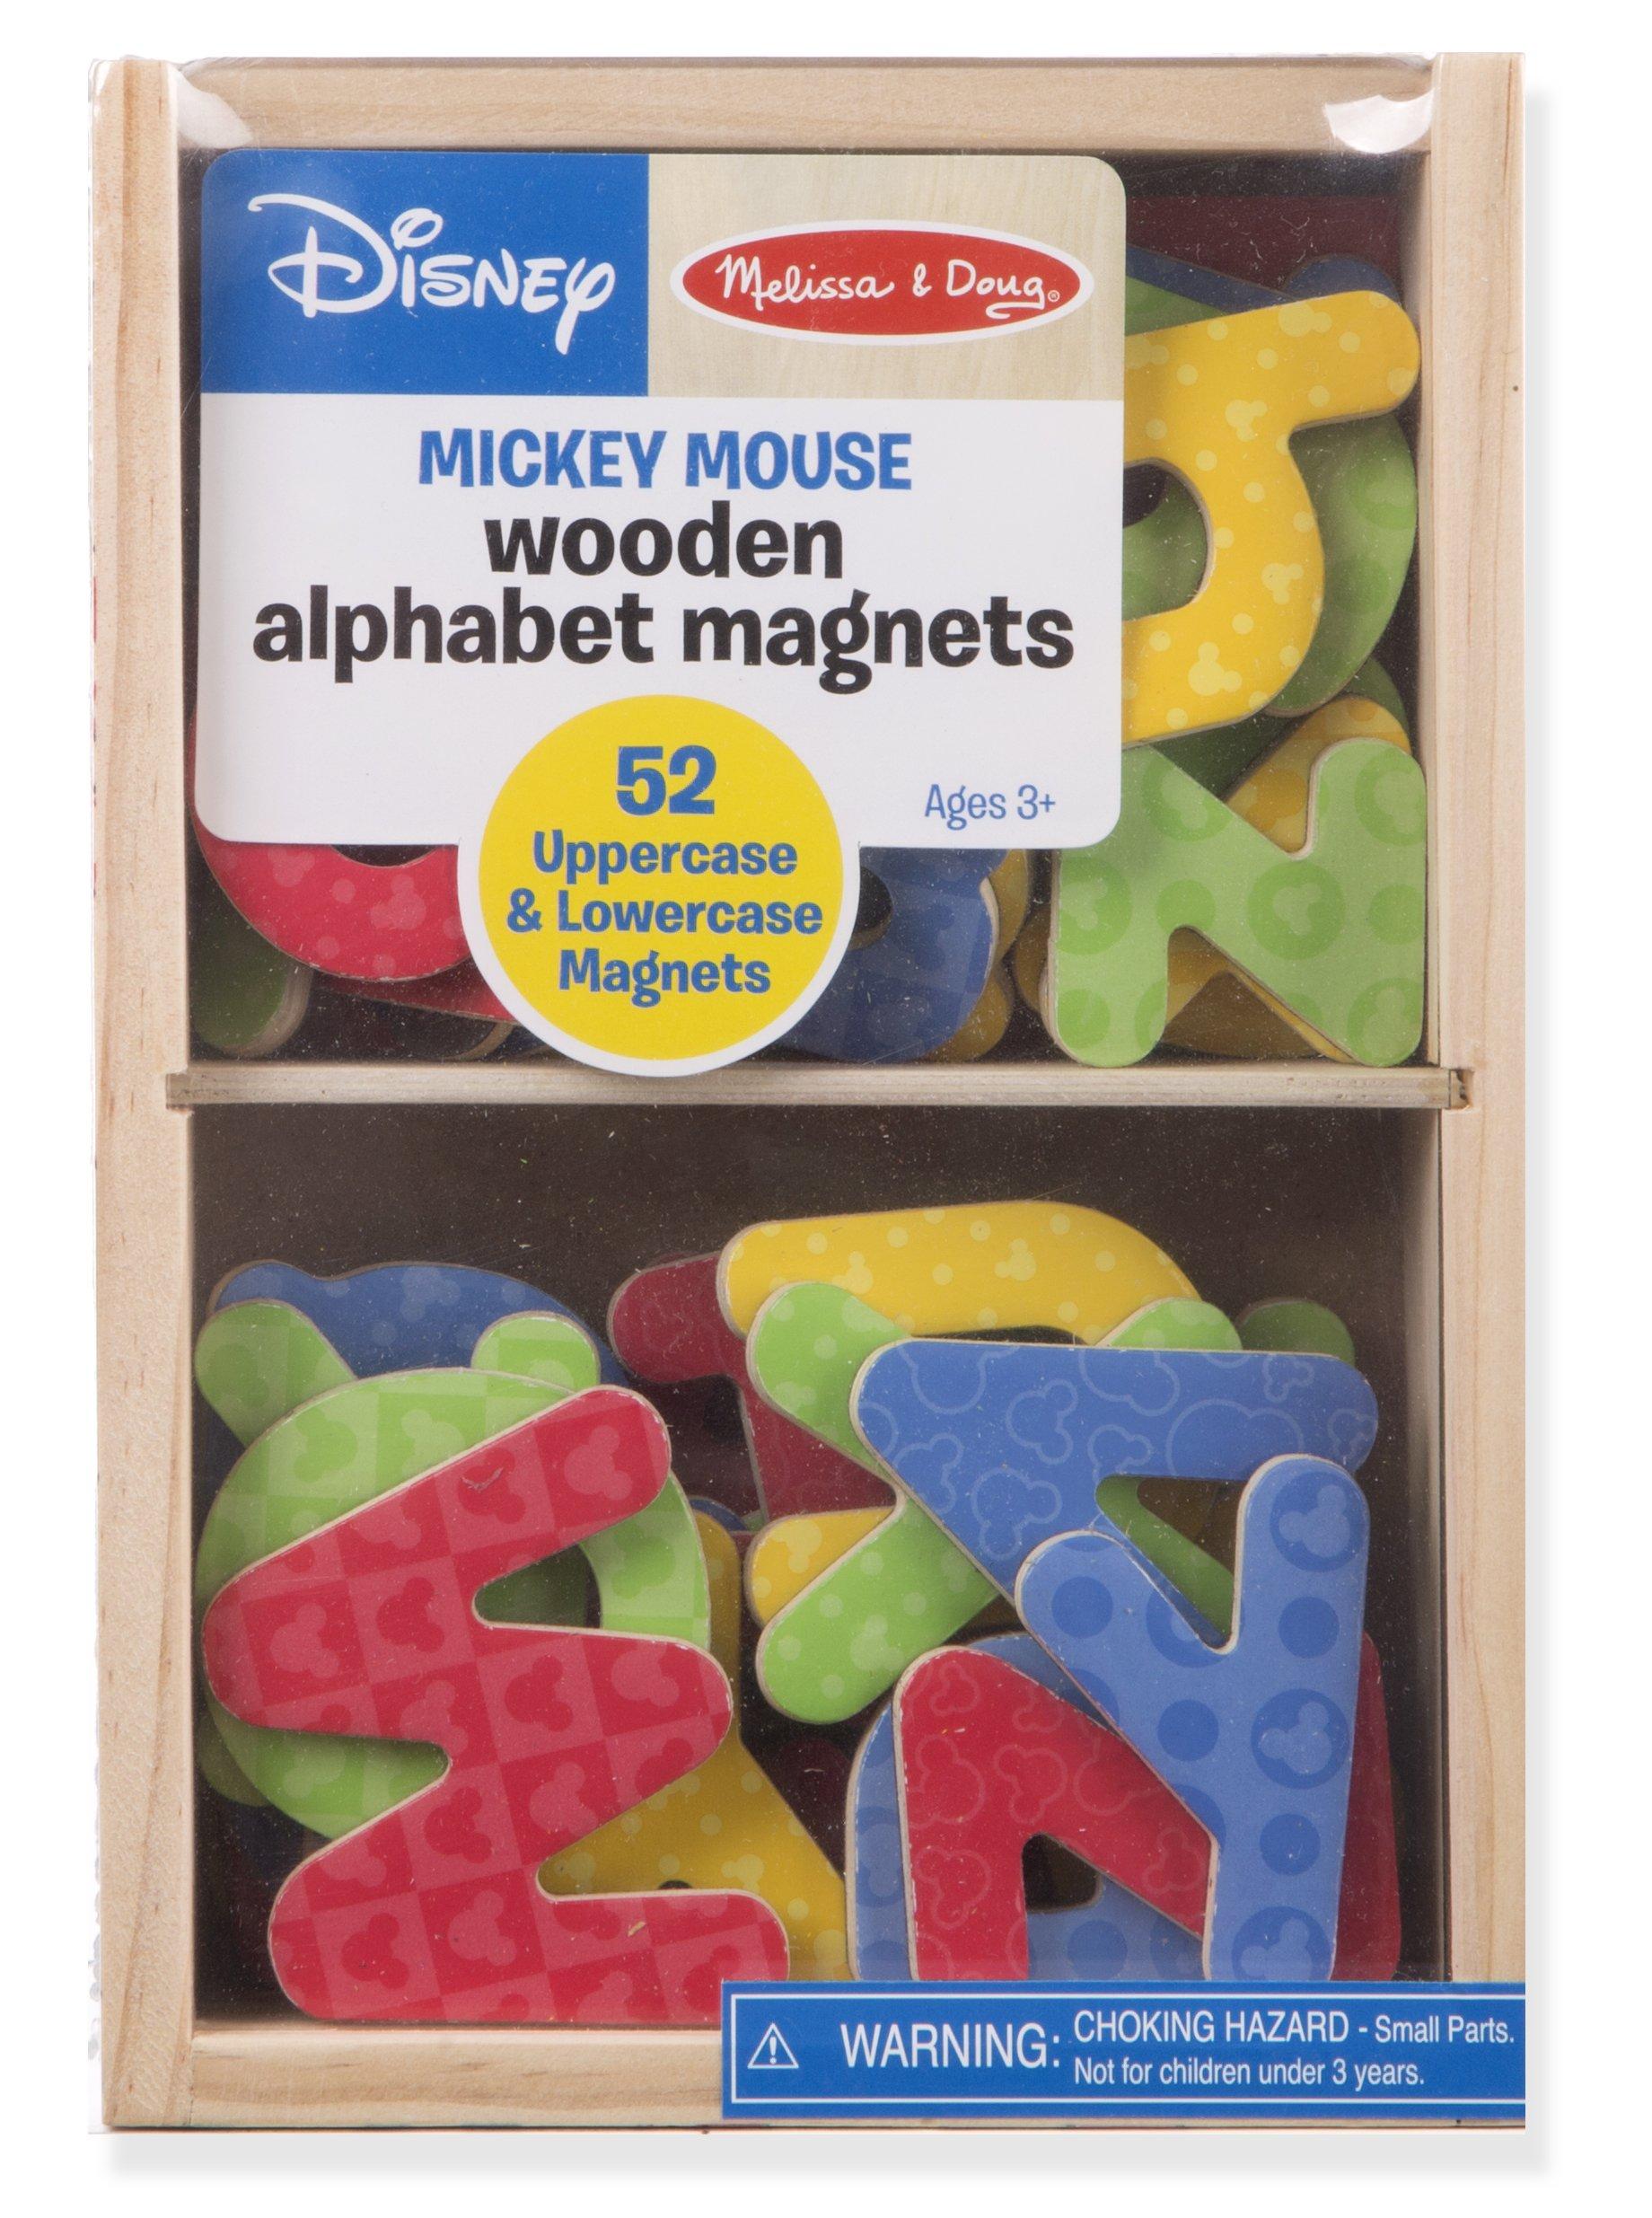 "Melissa & Doug Wooden Letter Alphabet Magnets, Developmental Toys, Sturdy Wooden Construction, 52 Pieces, 7.8"" H x 5.45"" W x 1.85"" L"